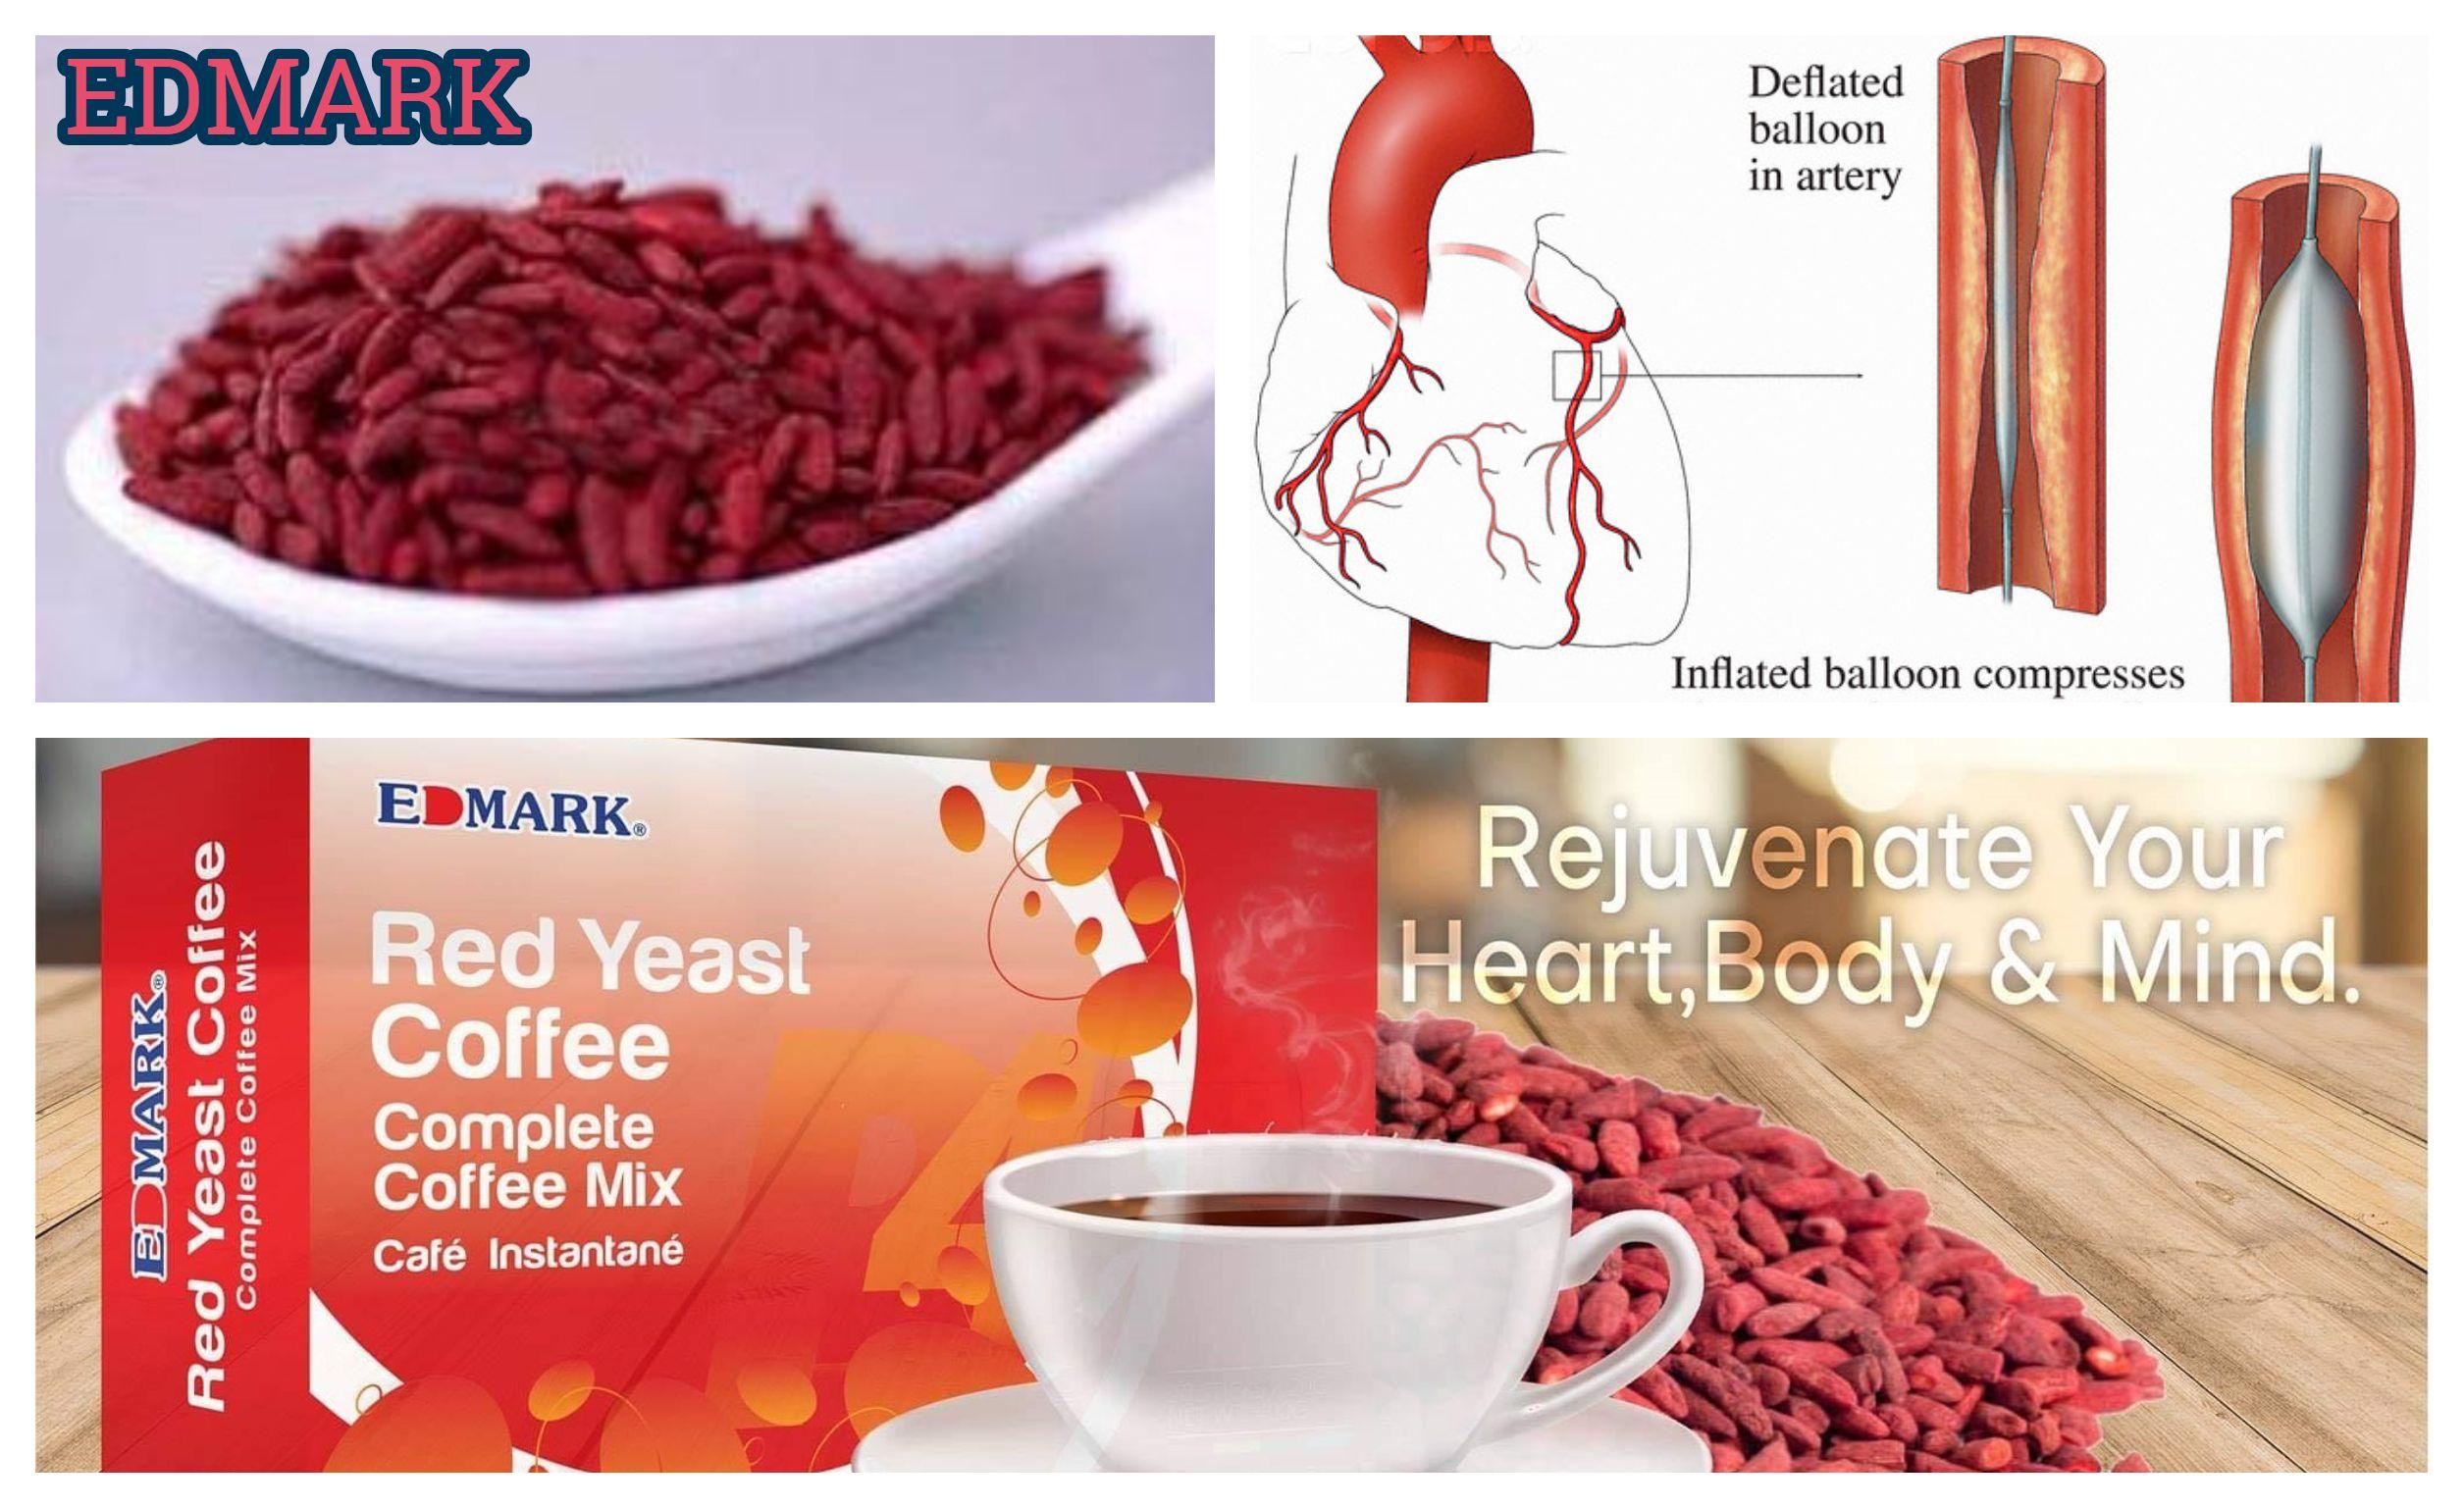 Red Yeast قهوة الخميرة الحمراء مضاد للدهون الثلاثية و مضاد للكولسترول ومدعمة للقلب و الأوعية الدموية و مفيدة للدورة الدموية Coffee Mix Yeast Rejuvenation